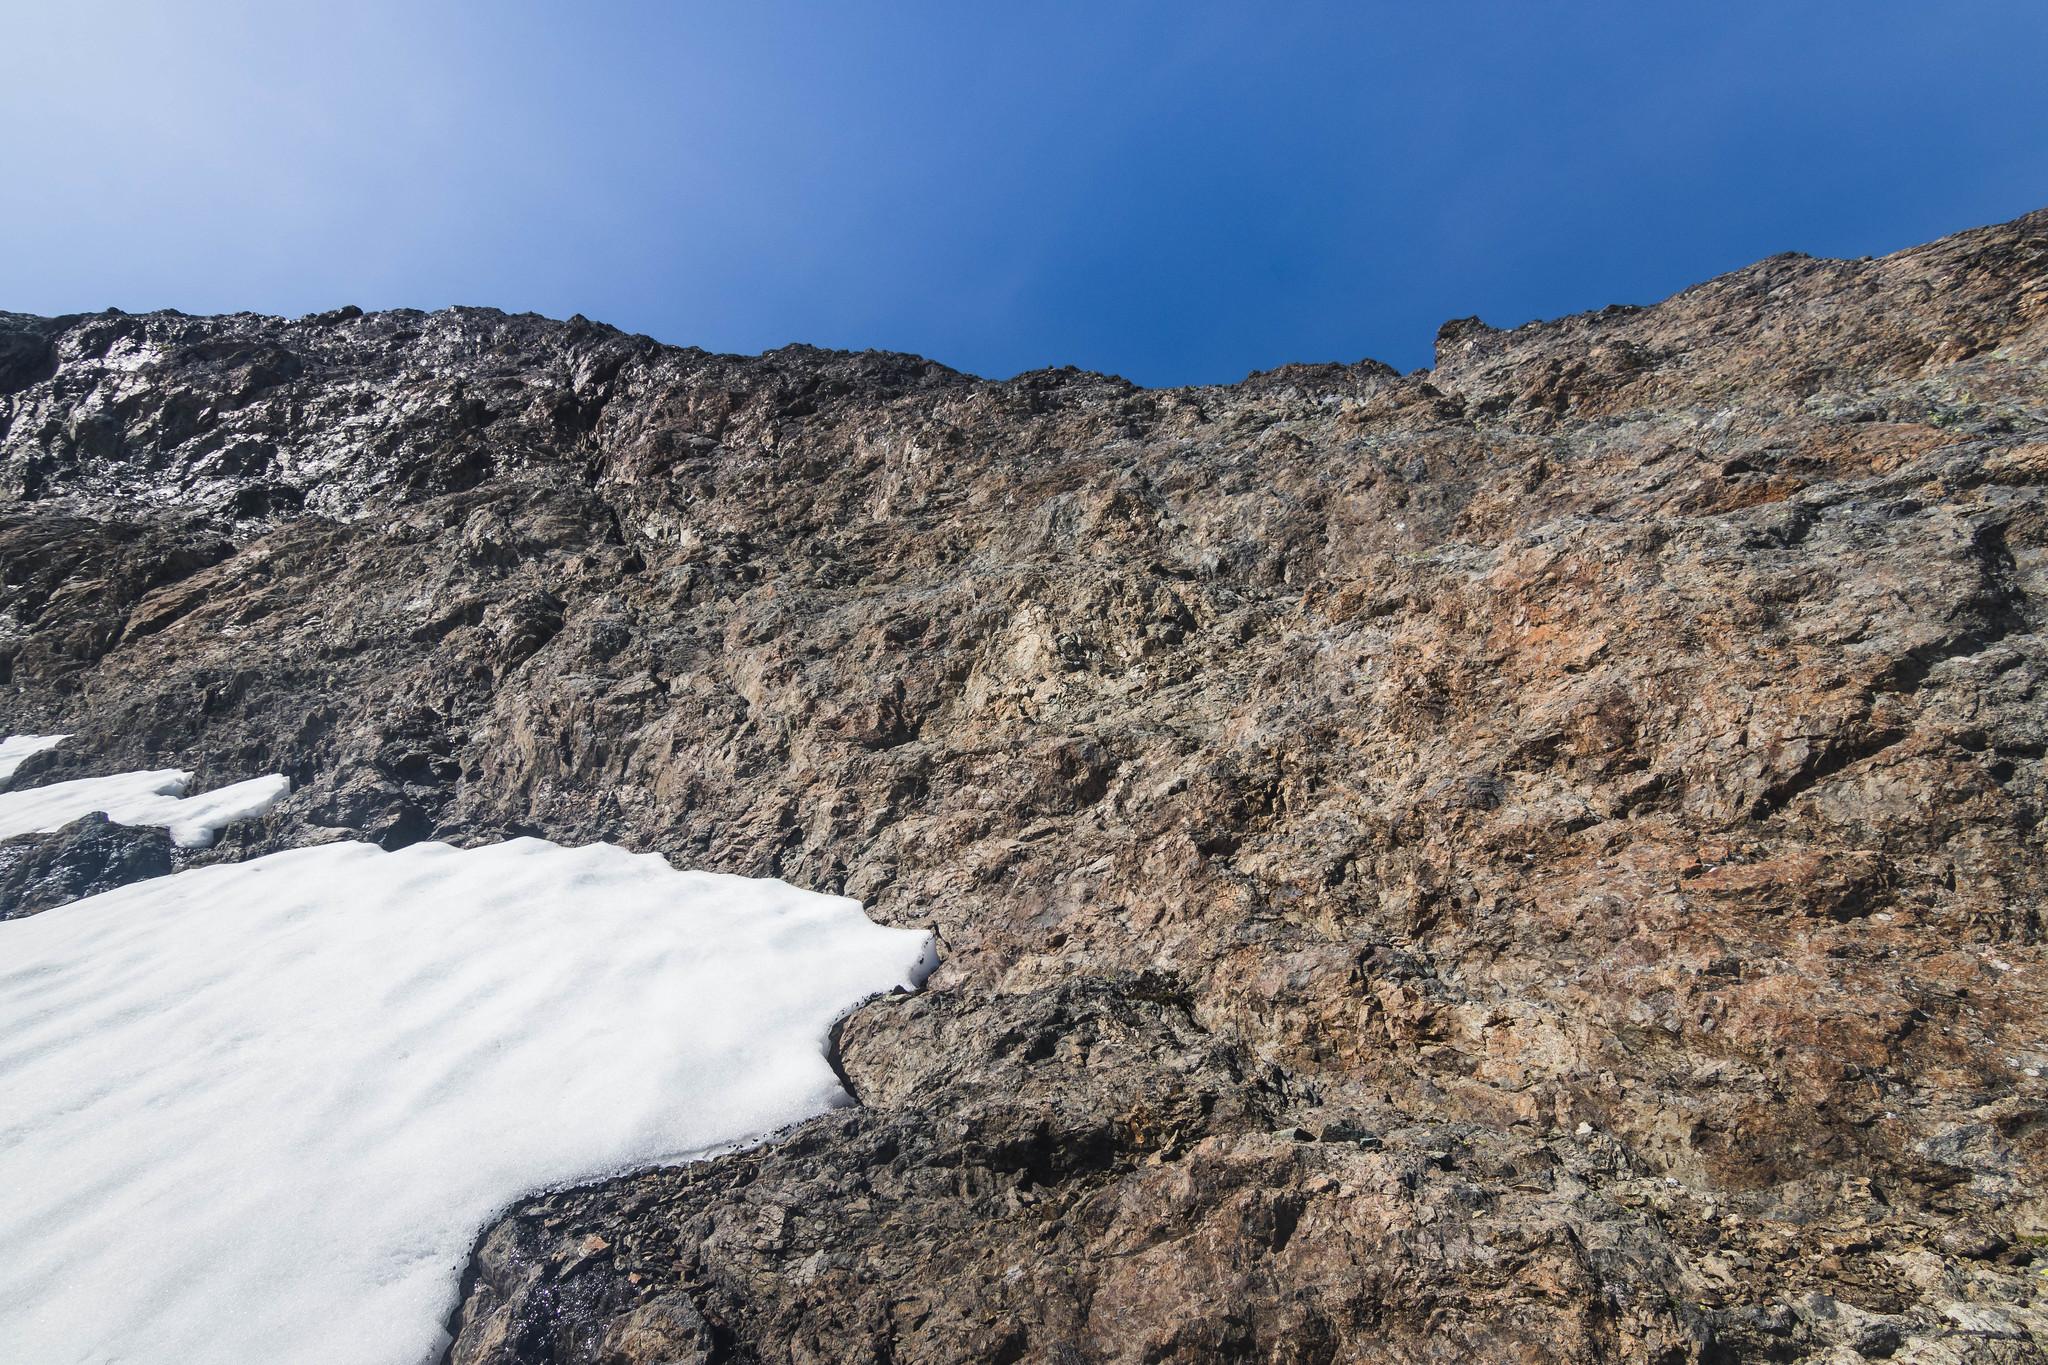 The ridge route